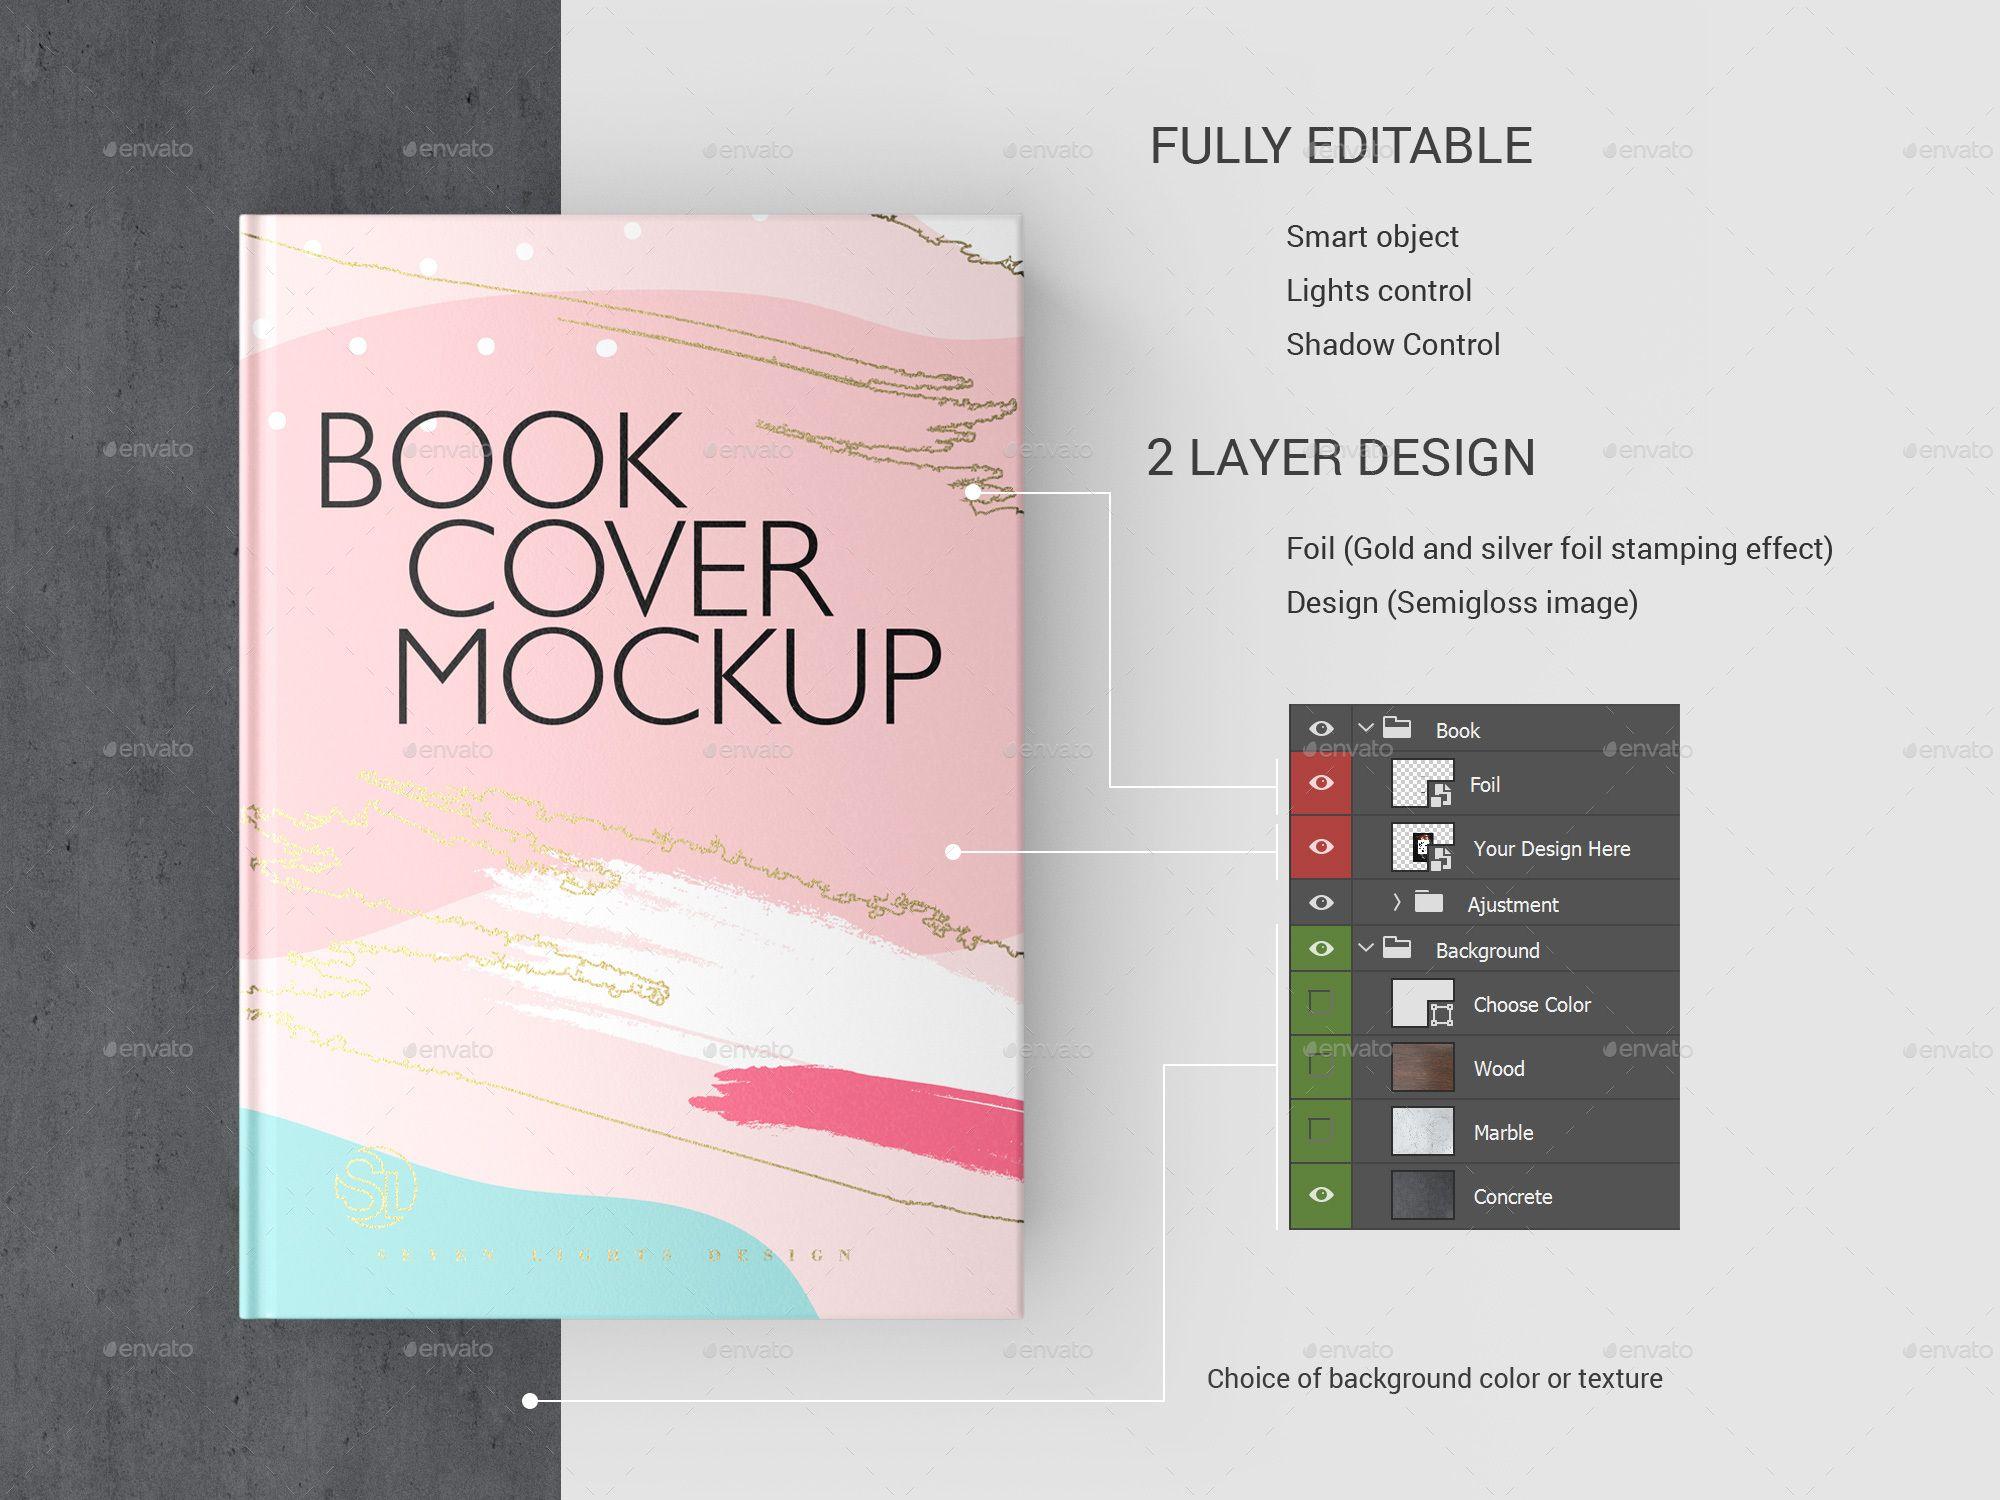 Book Cover Mockup Ad Book, affiliate, Cover, Mockup